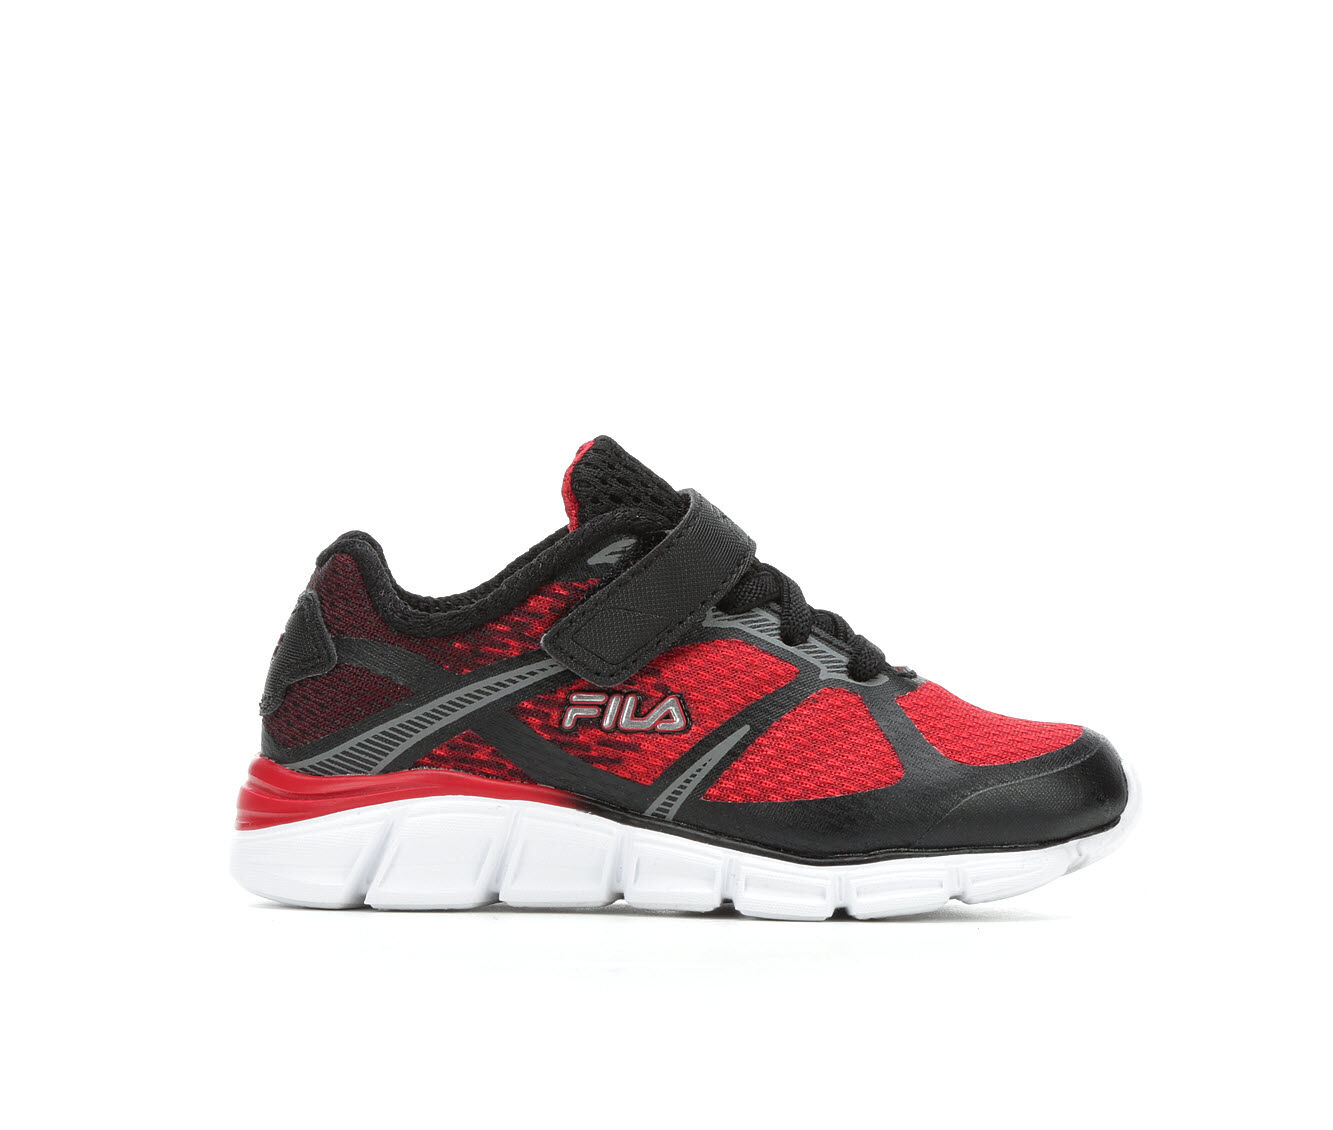 Boys' Fila Toddler Primeforce 3 Running Shoes